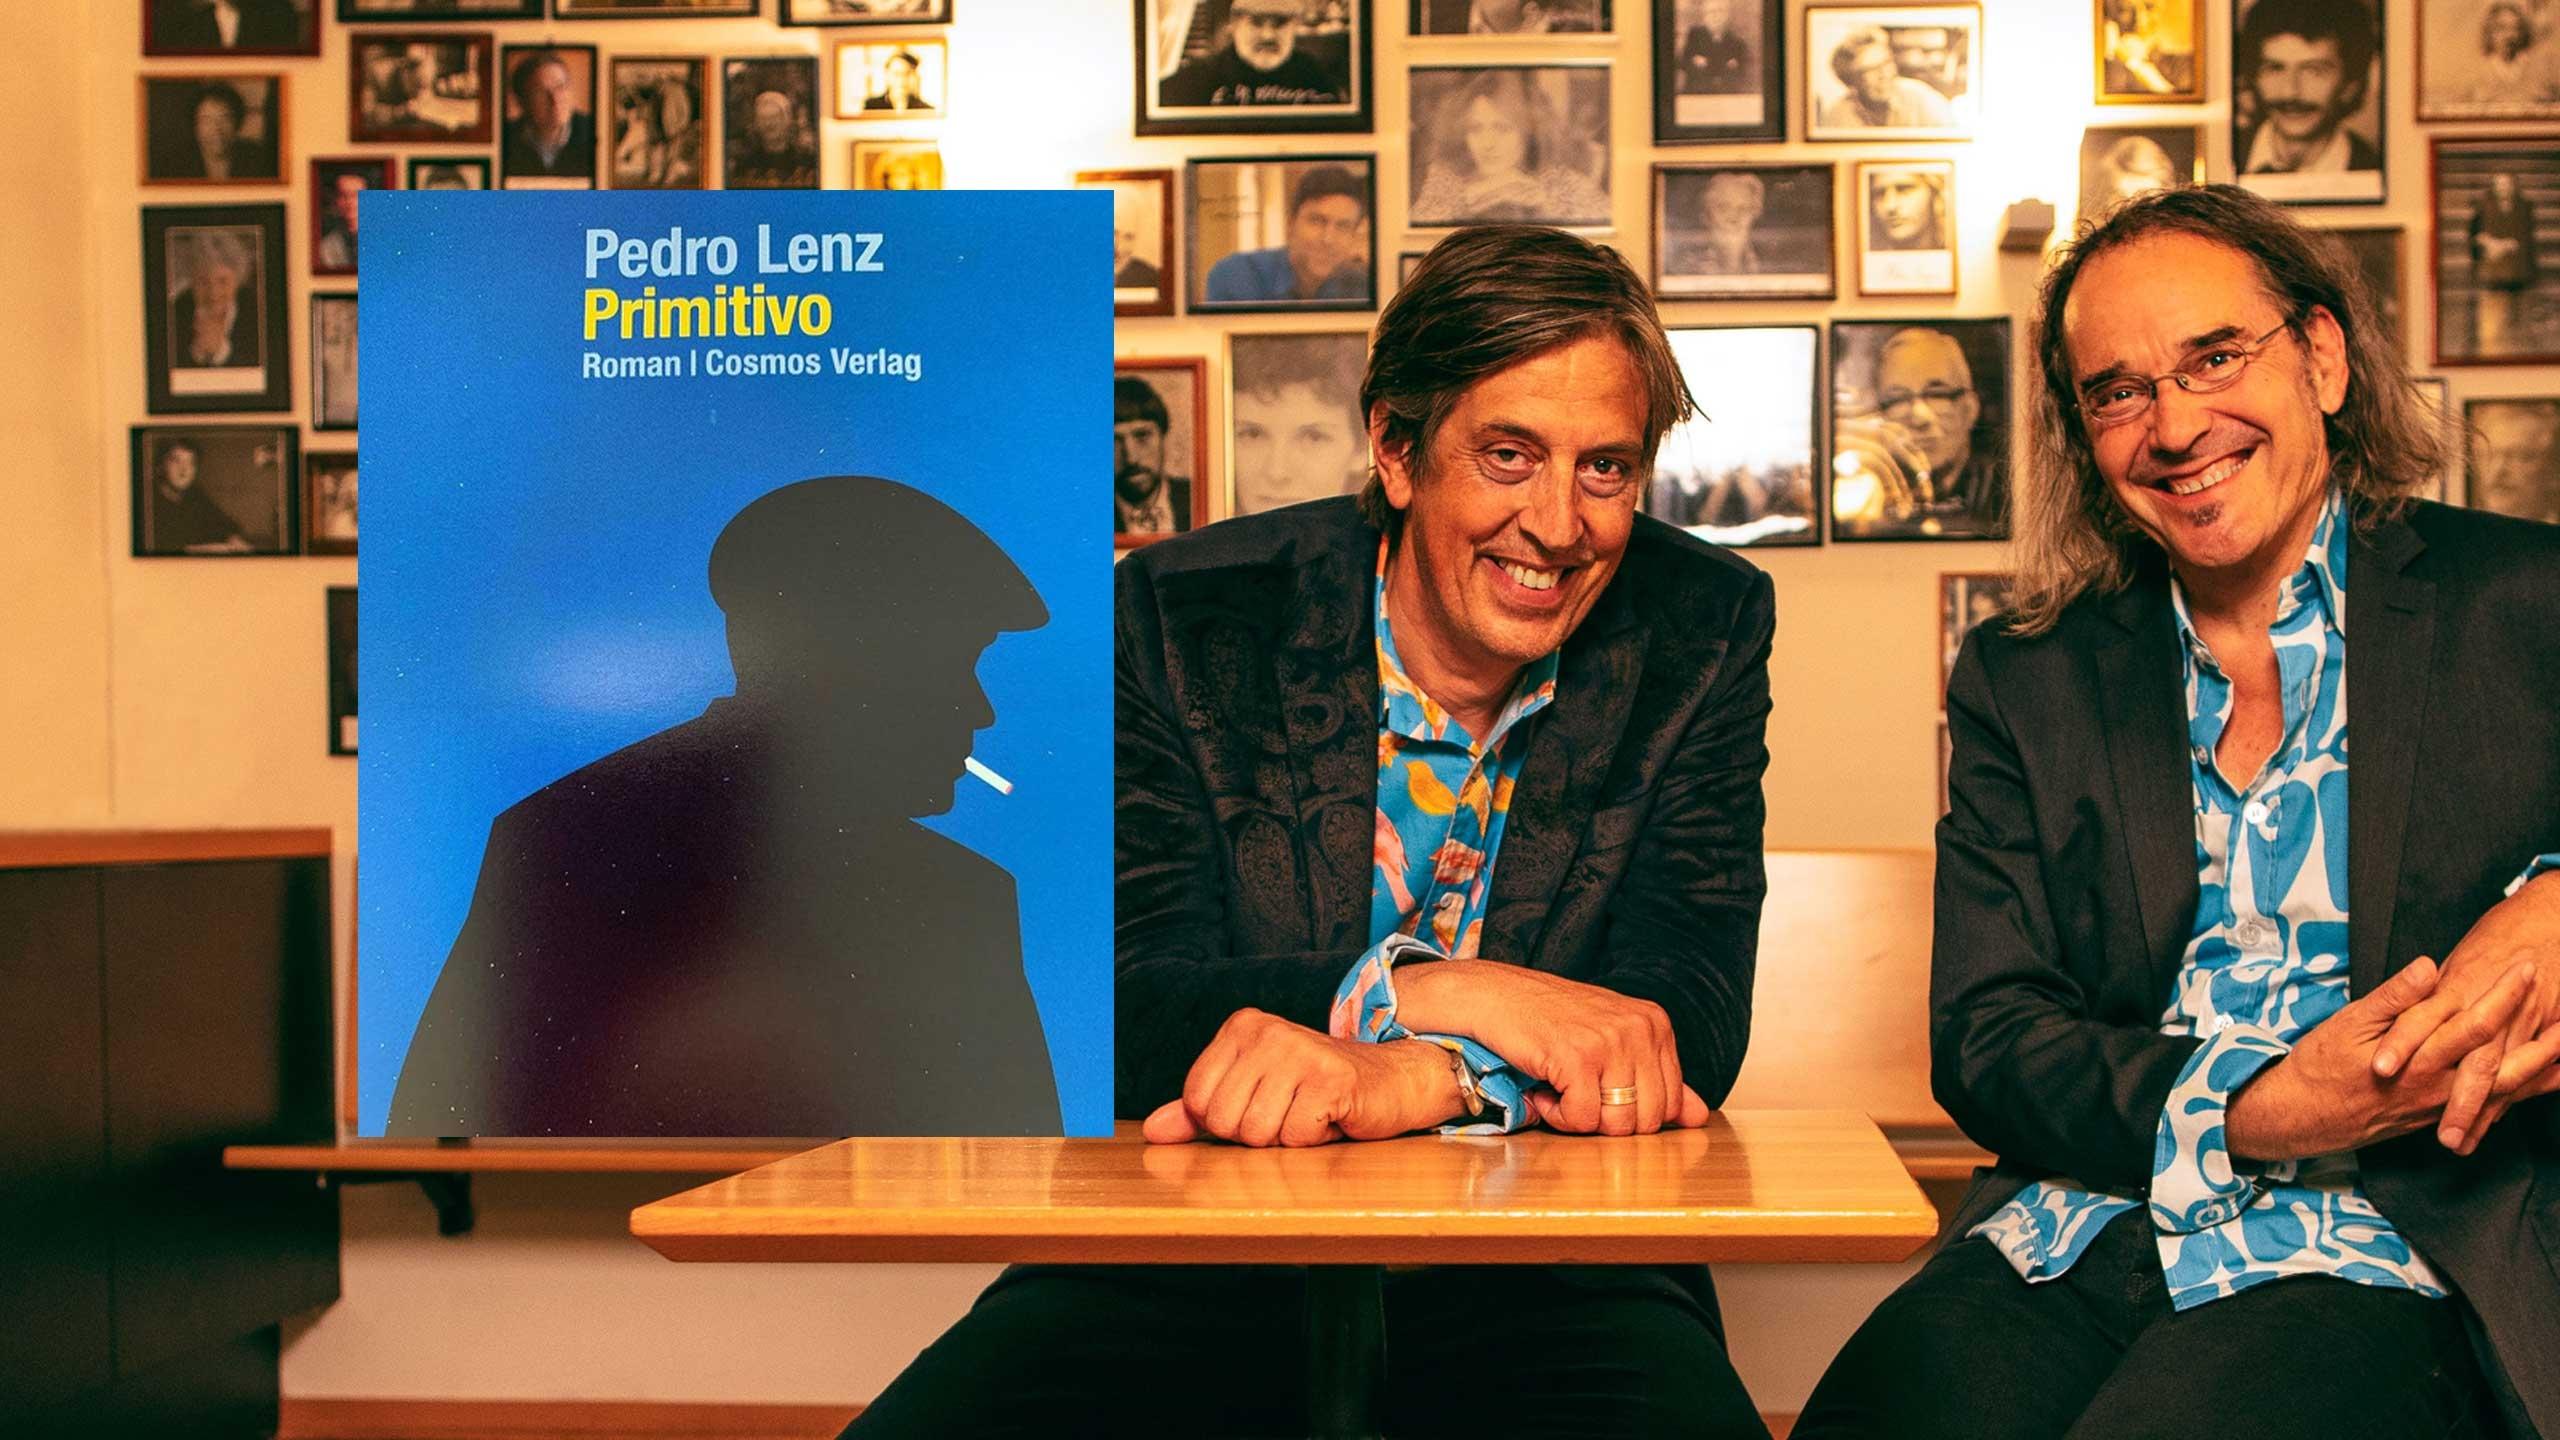 Primitivo - Pedro Lenz & Christian Brantschen